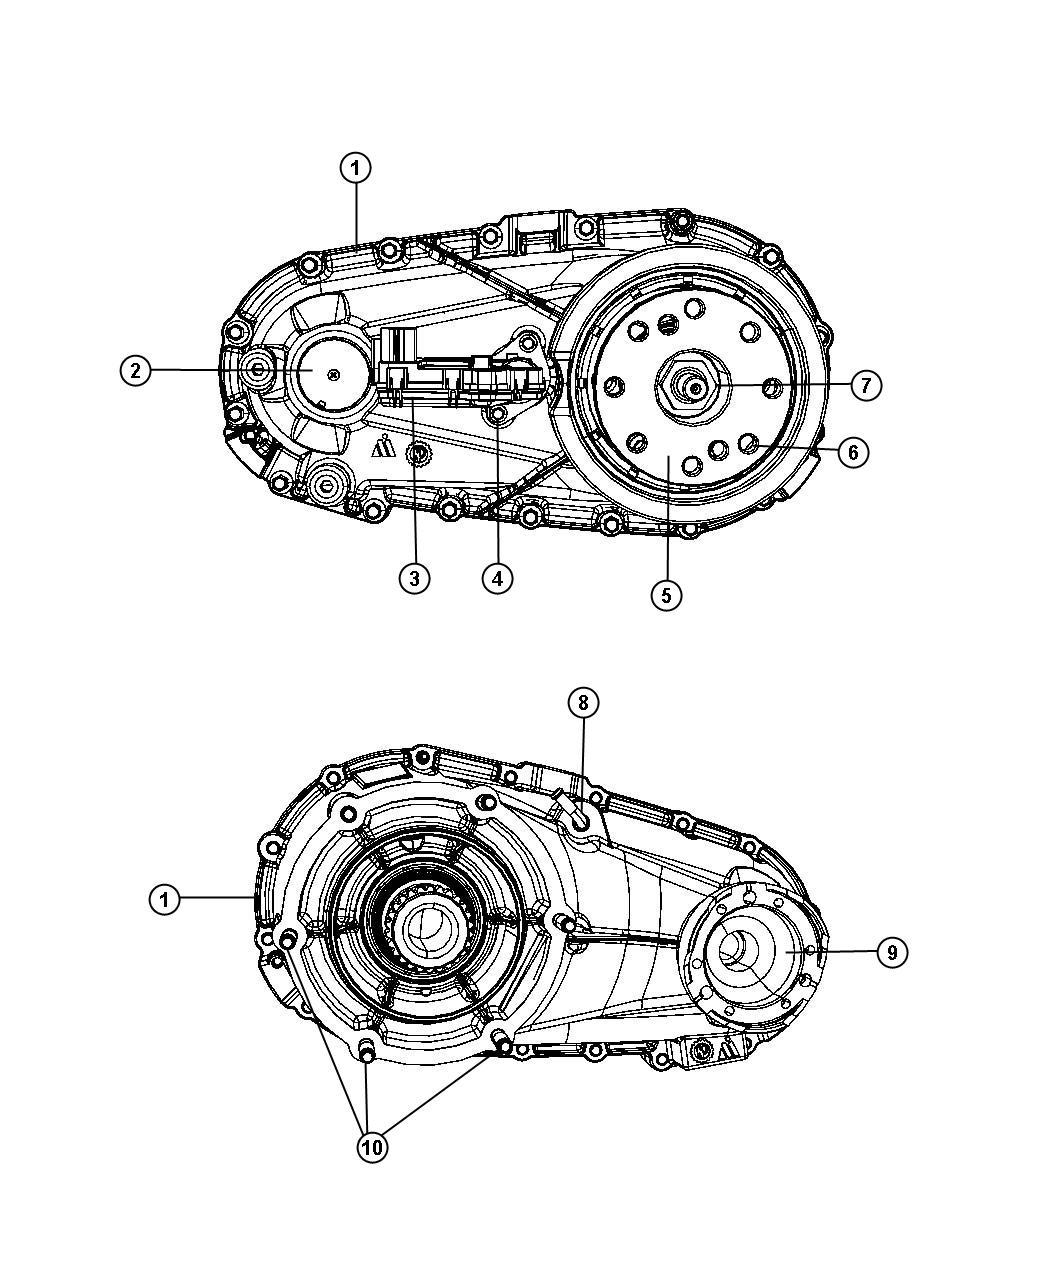 Dodge Nitro Actuator Transfer Case Identification